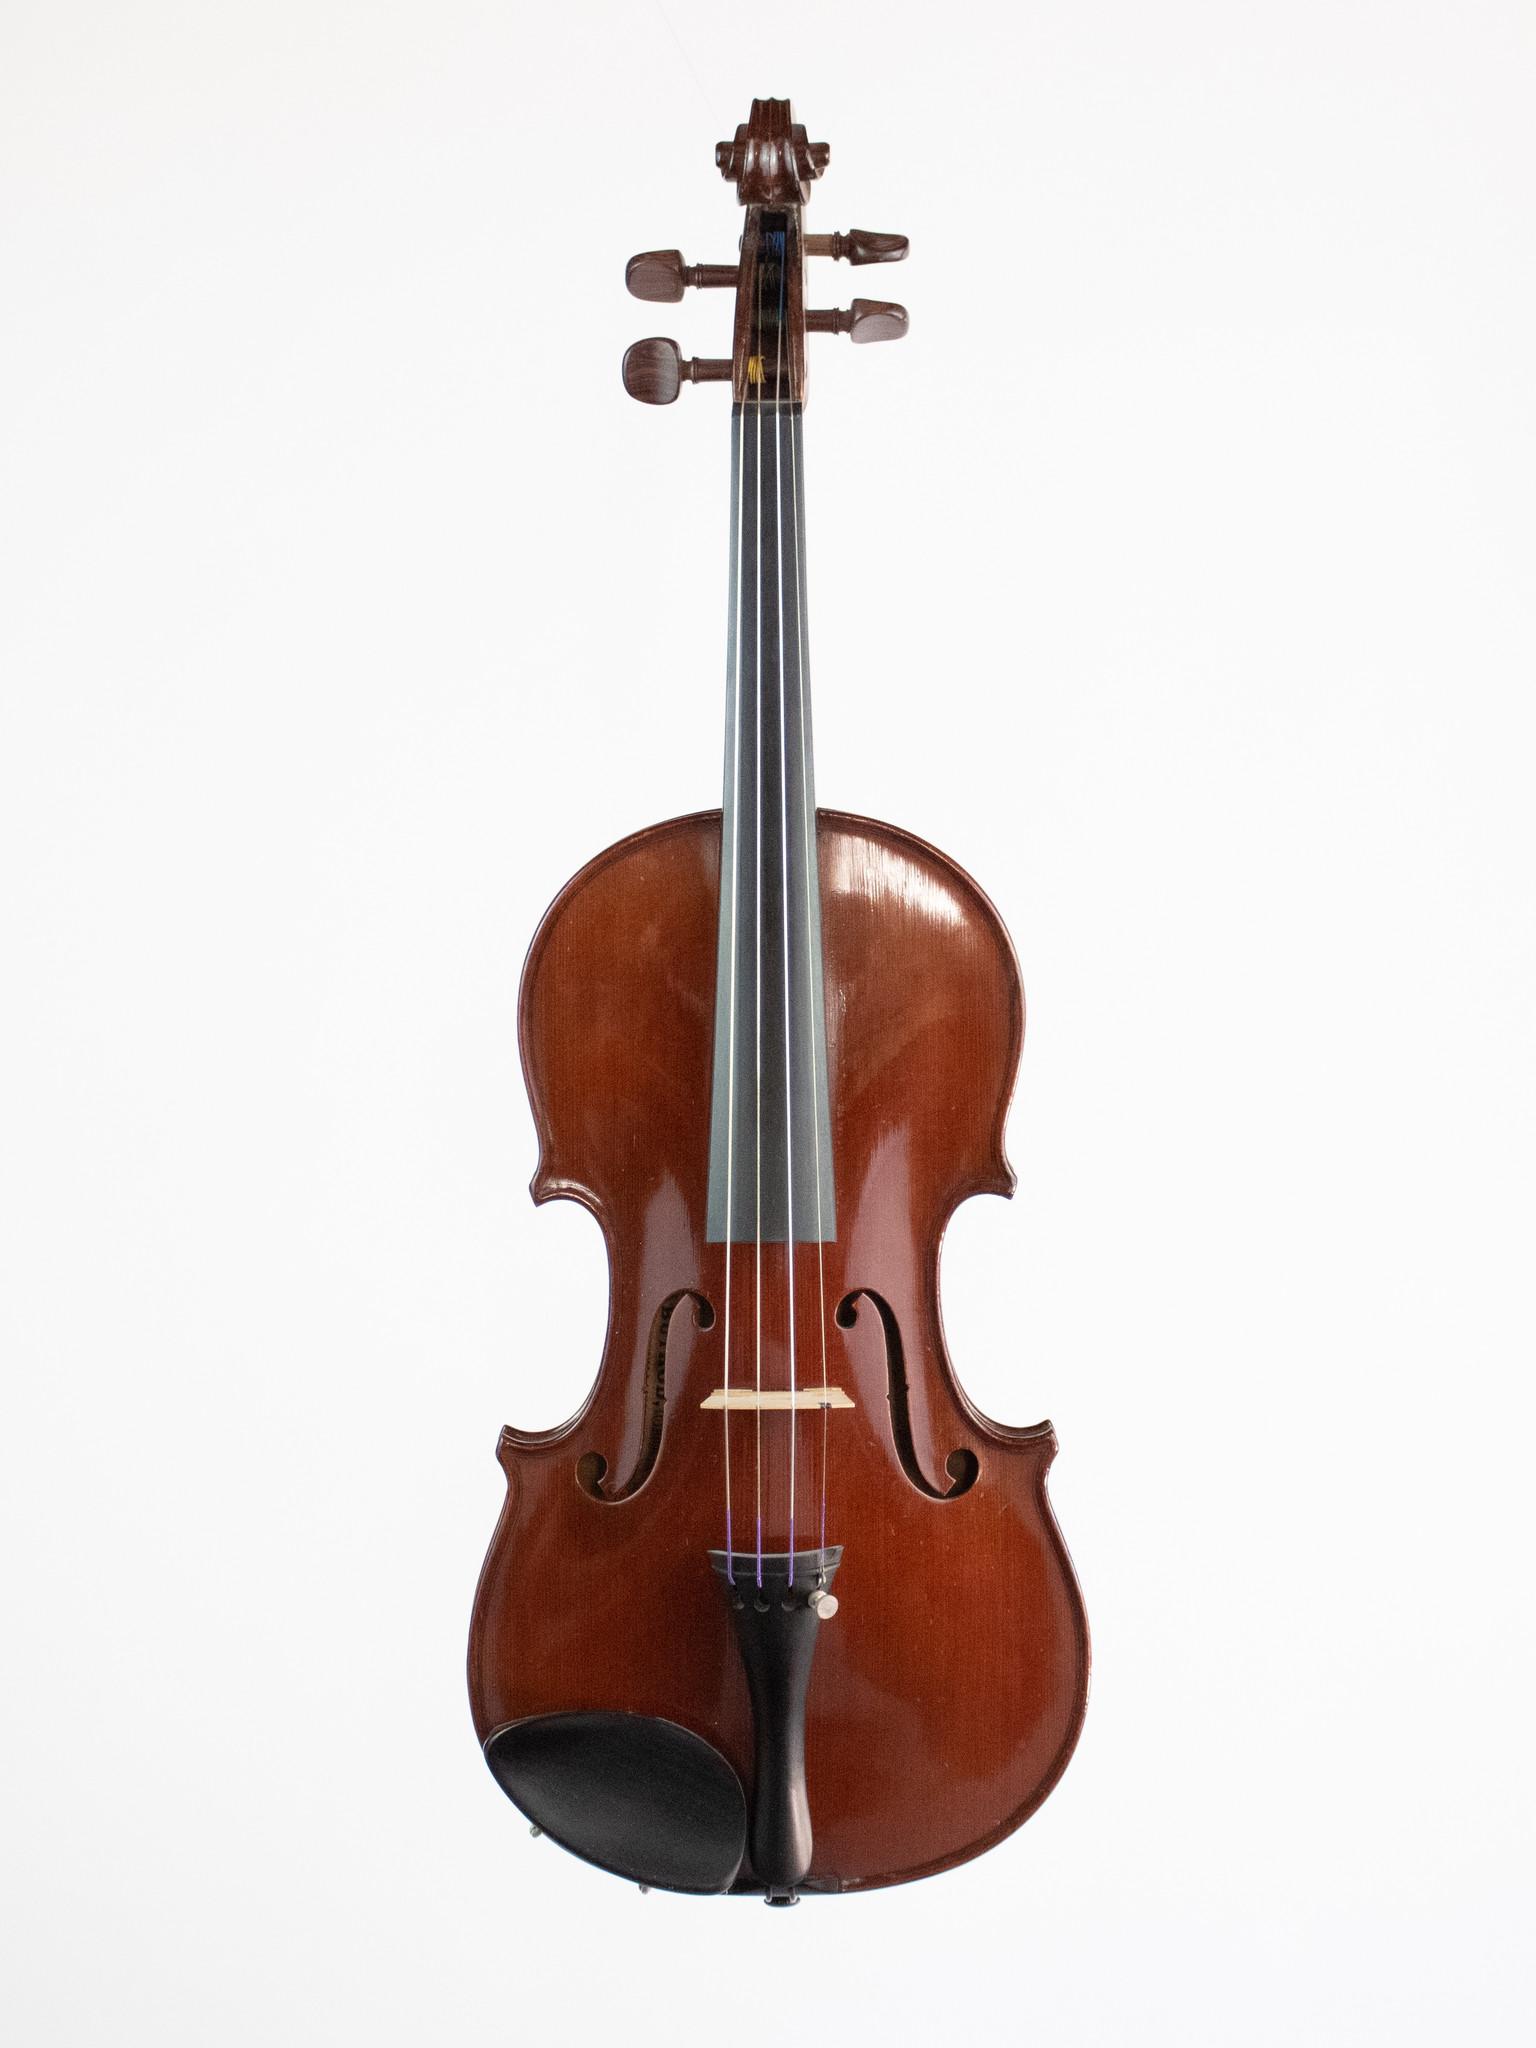 French BUTHOD violin, JTL, FRANCE ca 1920